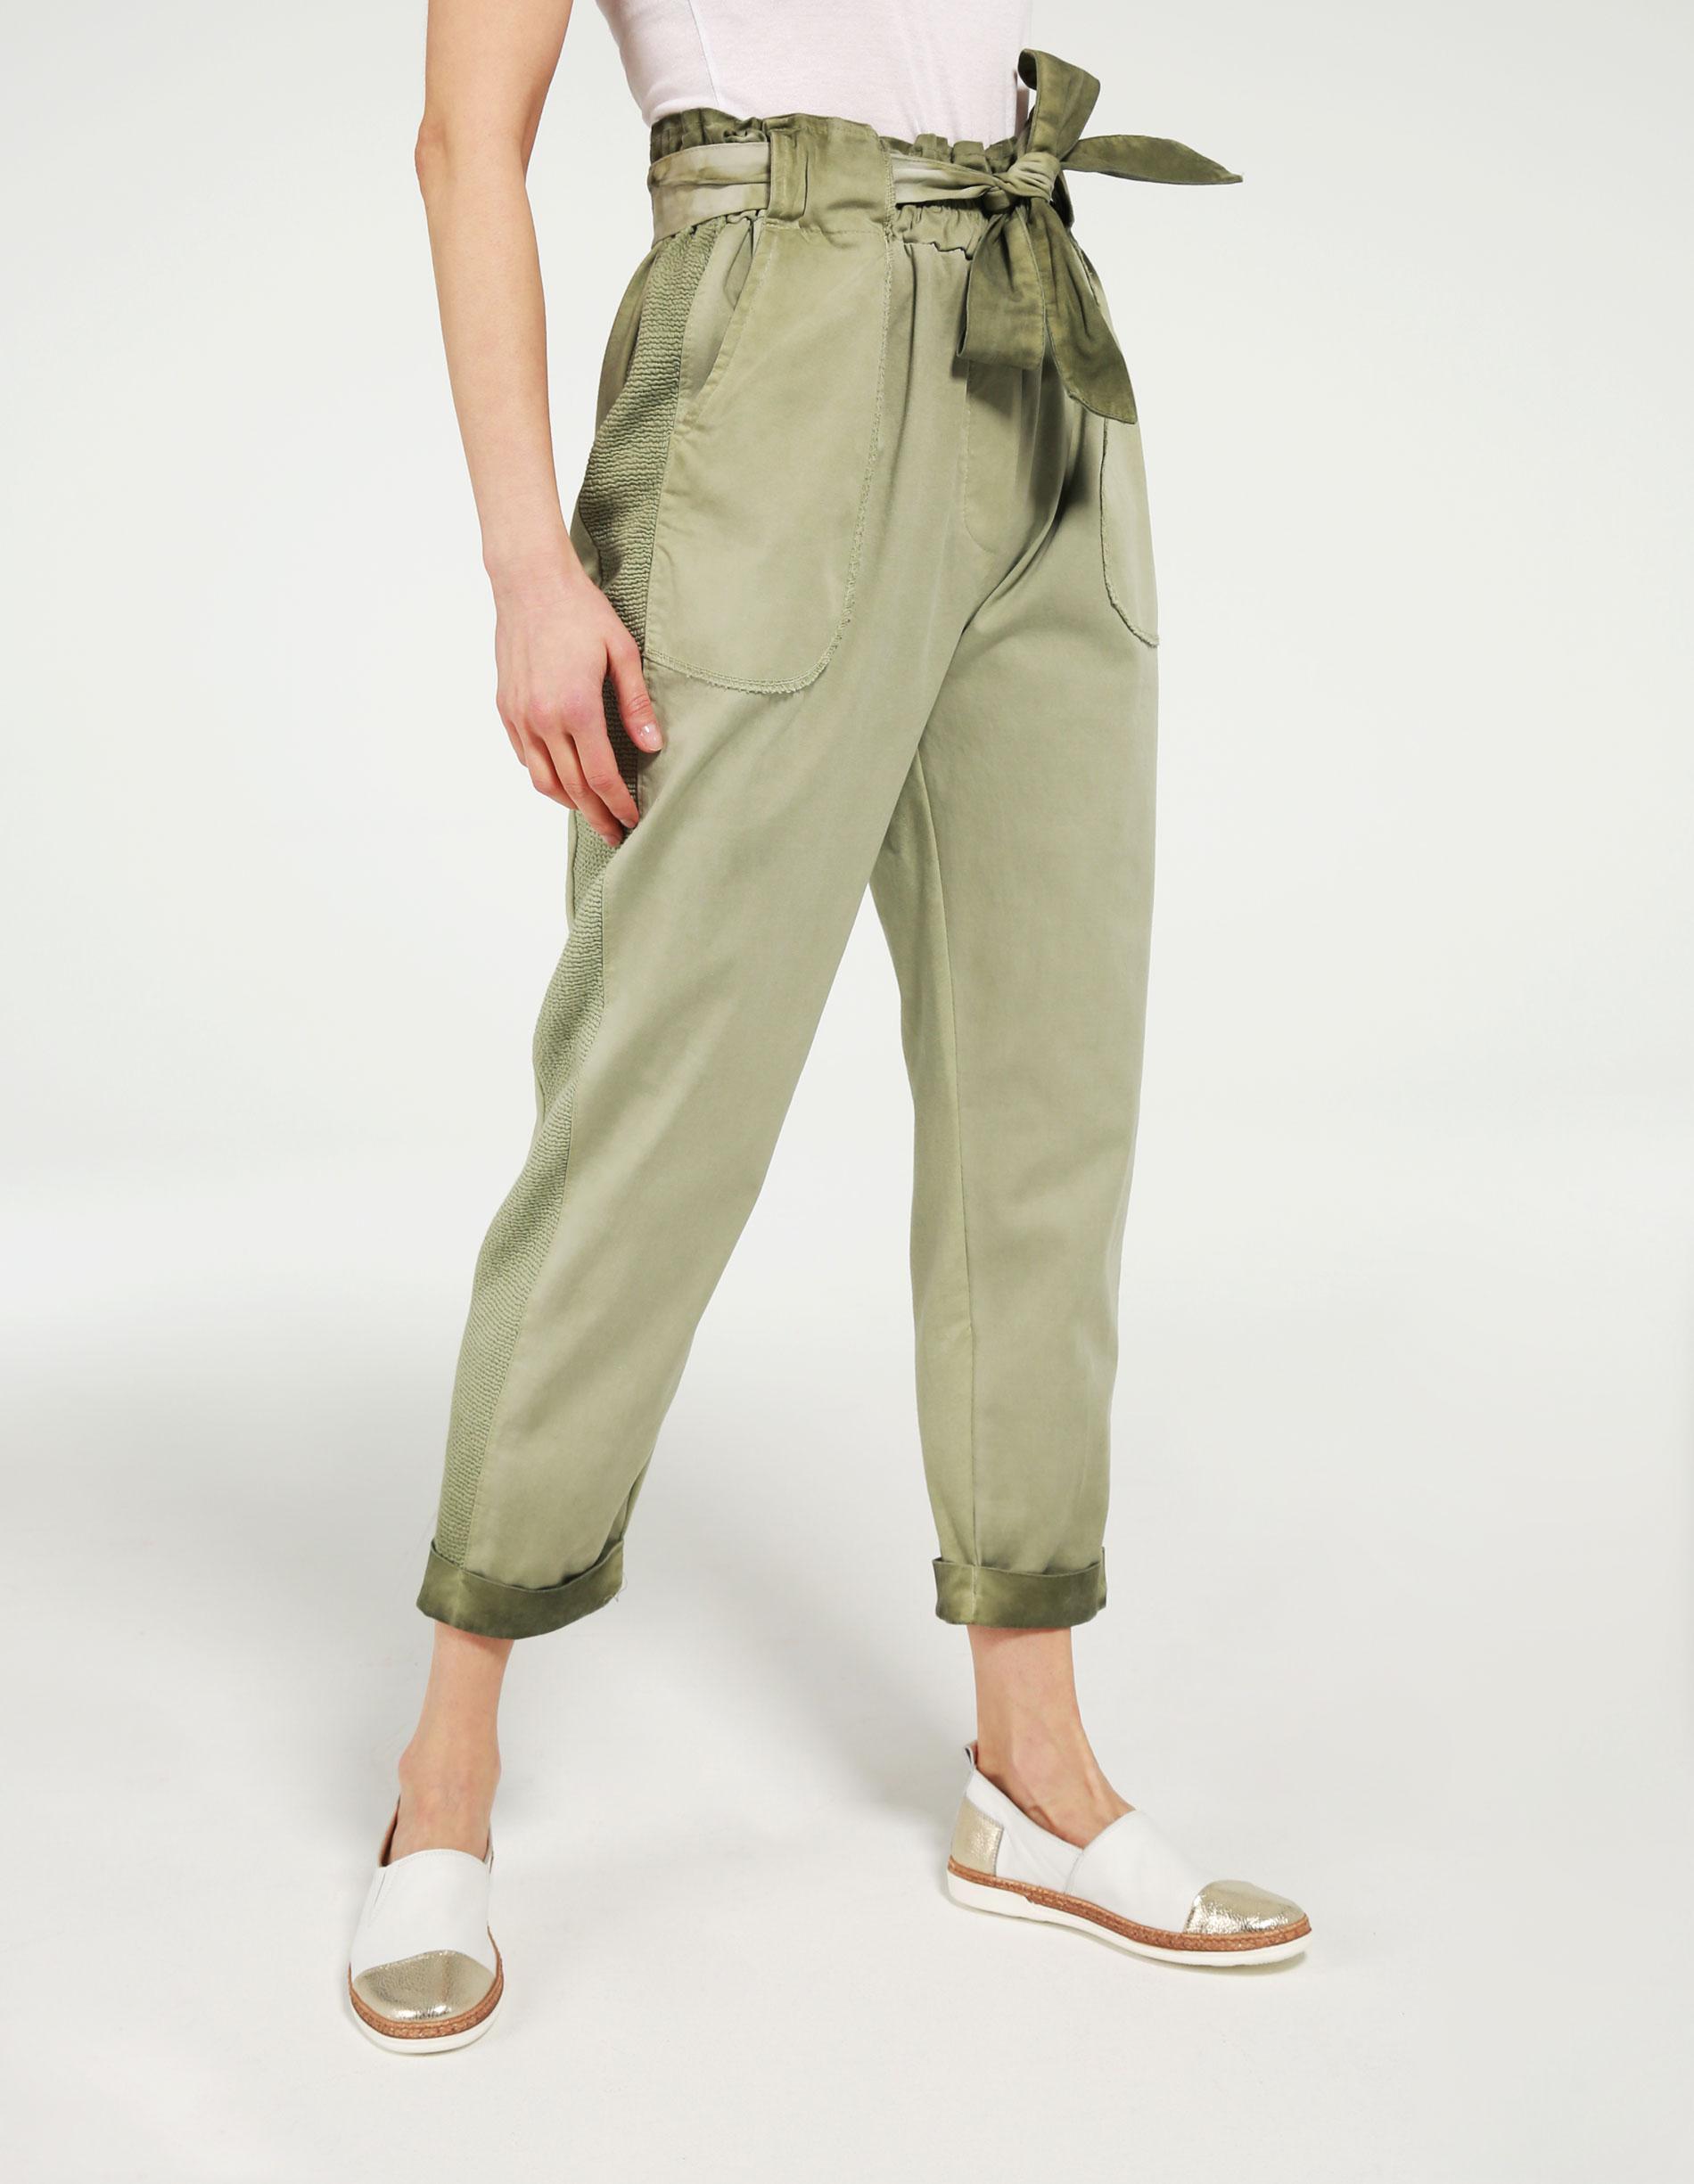 Spodnie - 126-6977 MILI - Unisono